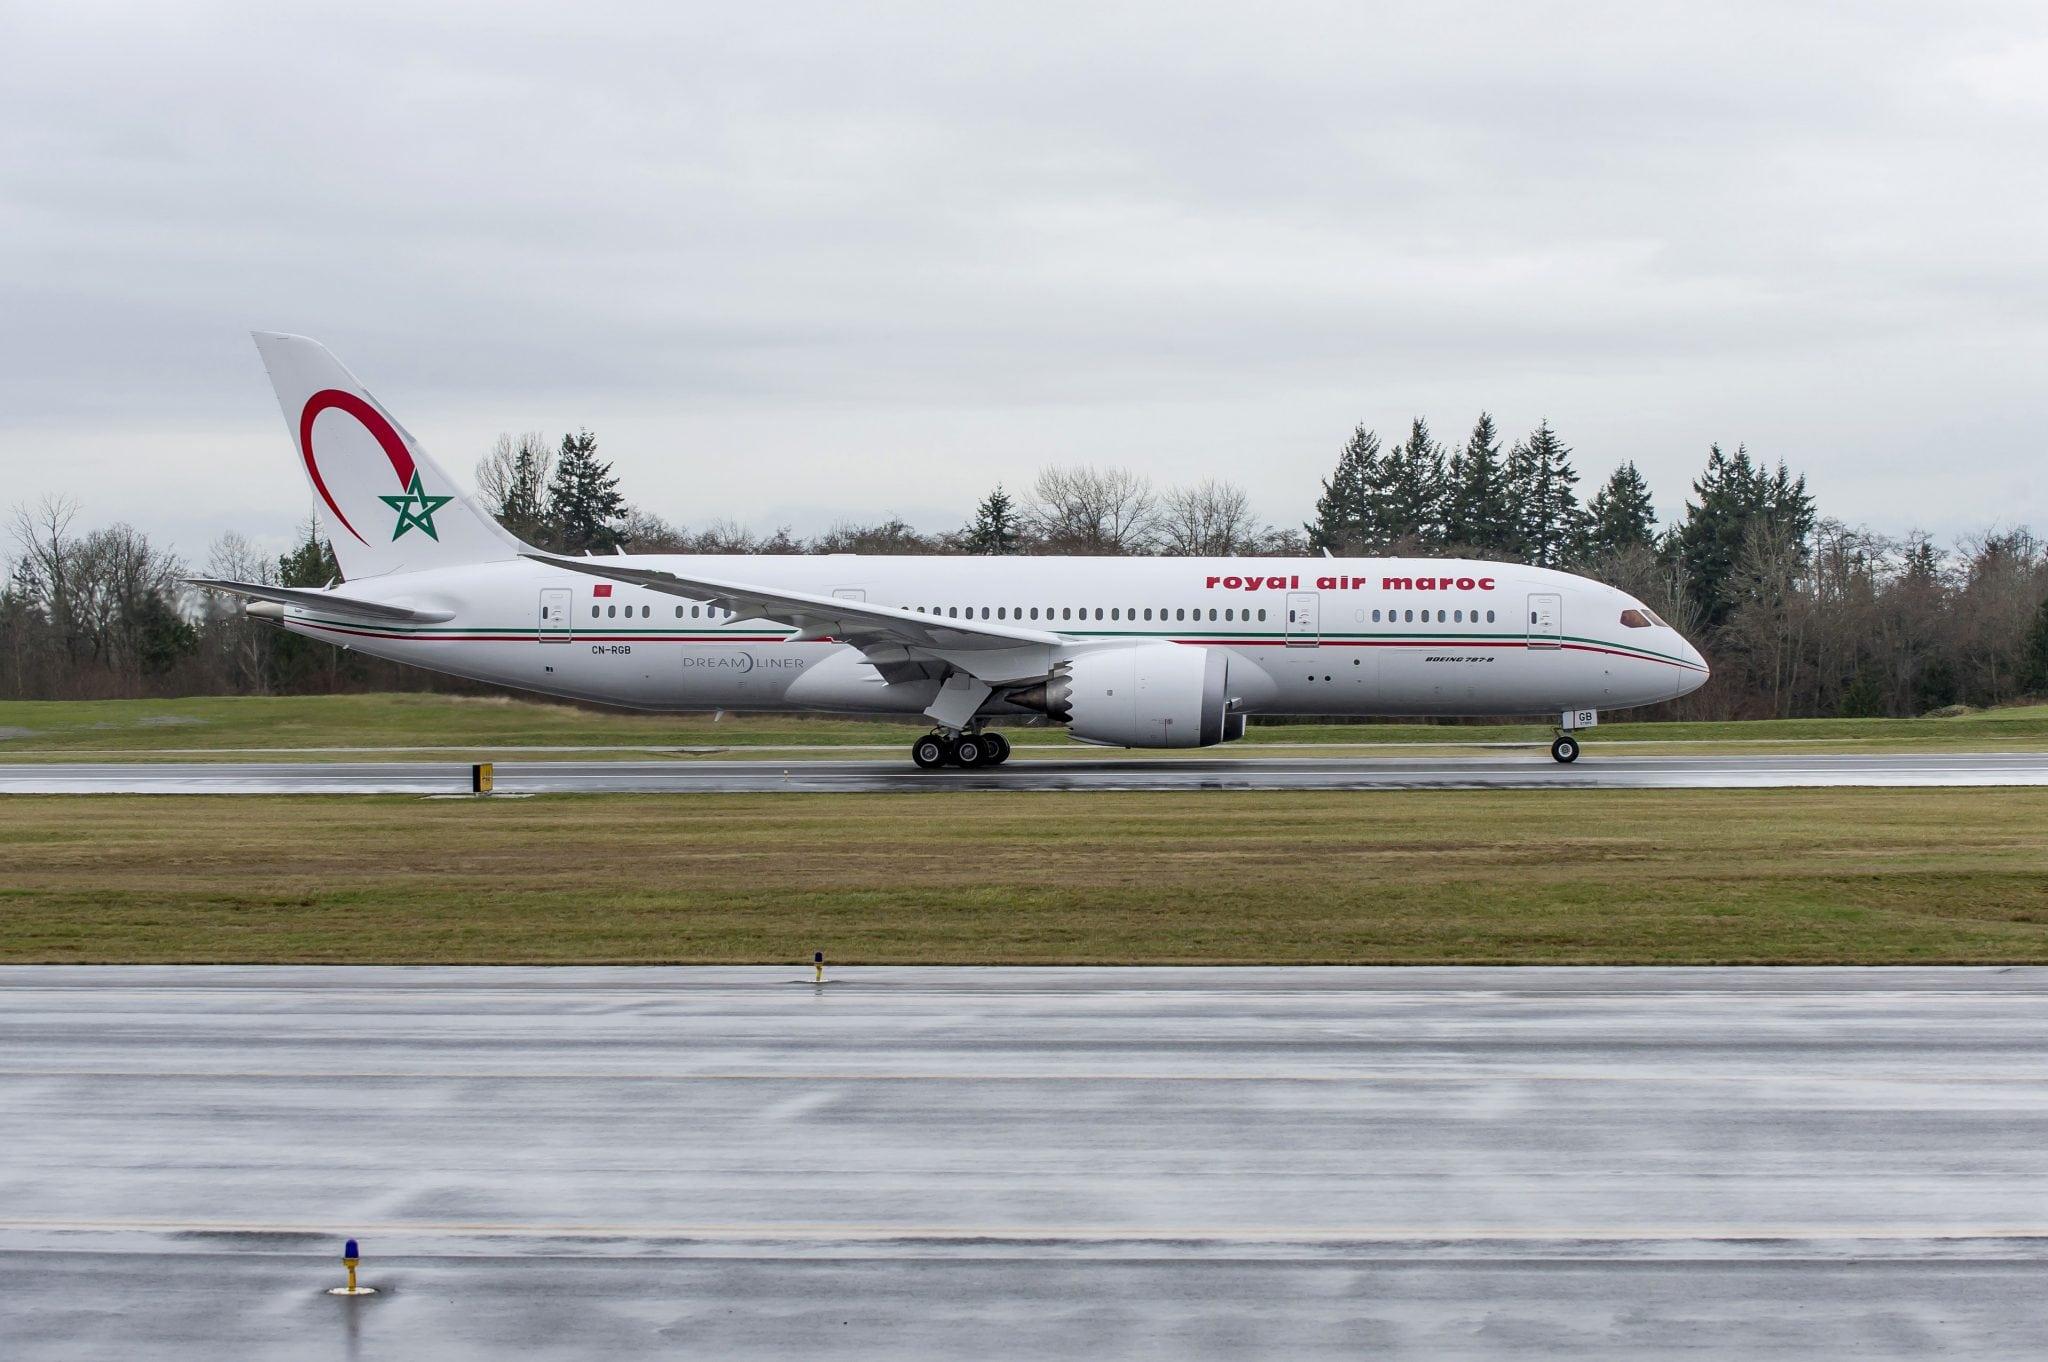 Royal Air Maroc's first 787 Dreamliner